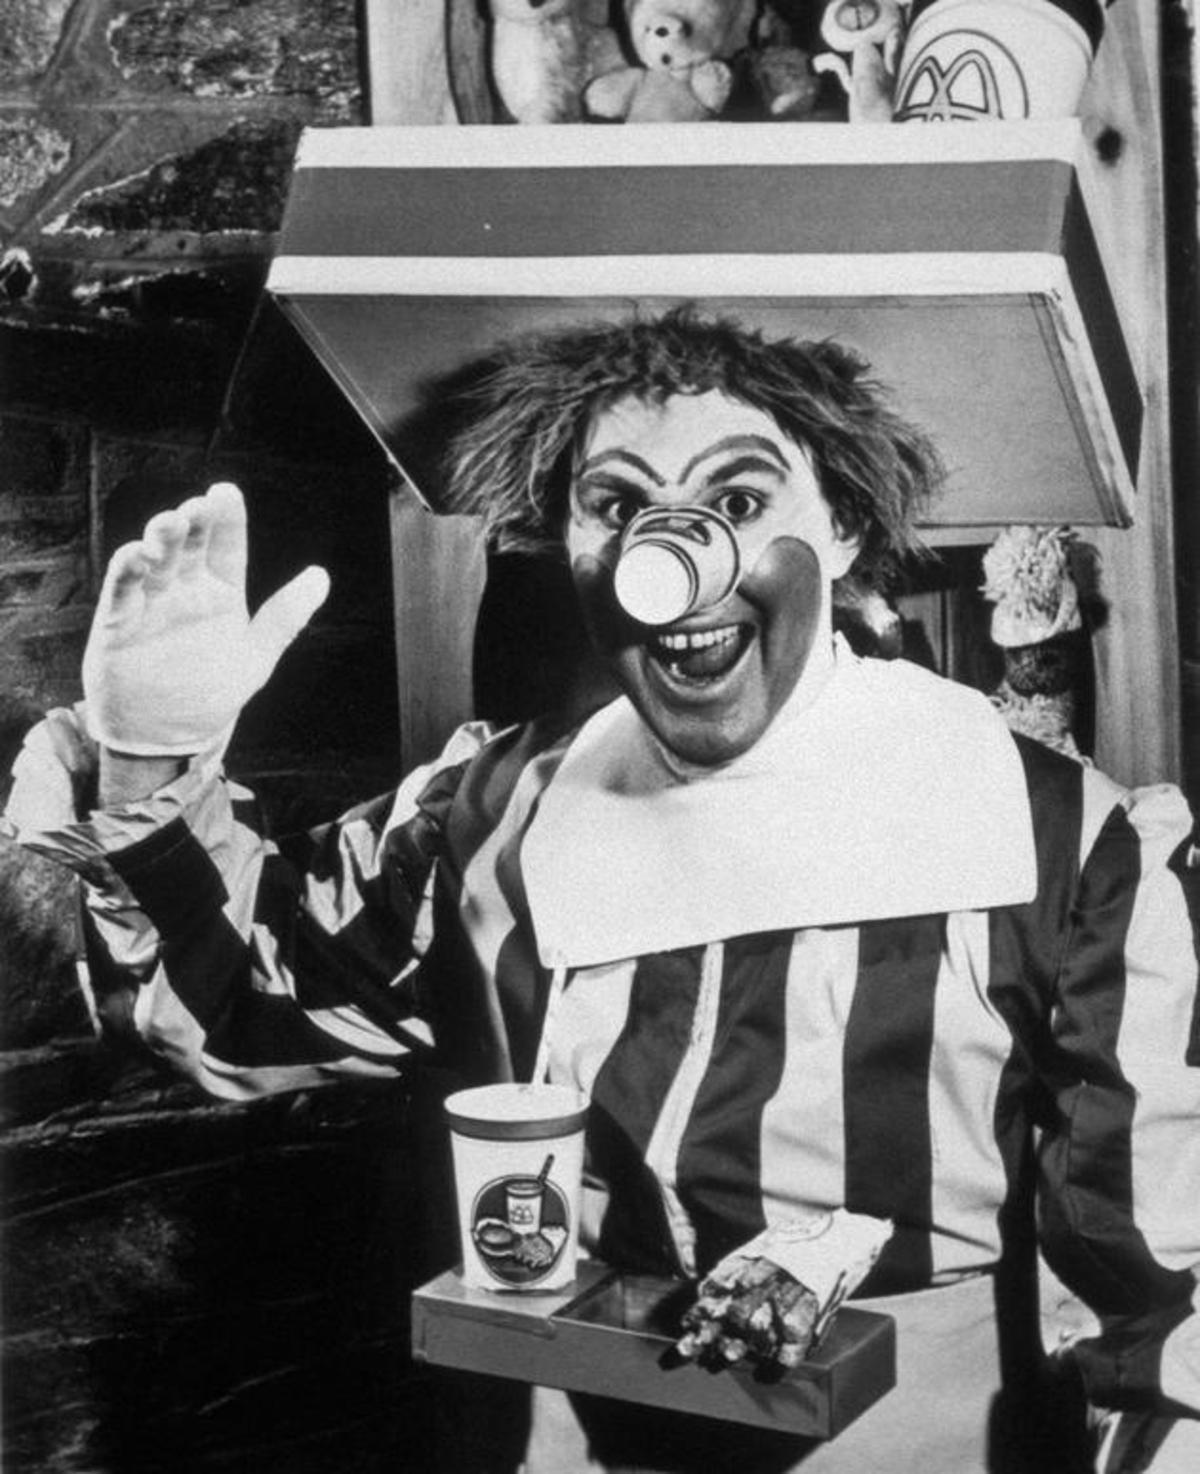 the-original-ronald-clown-of-mcdonald's-in-1963